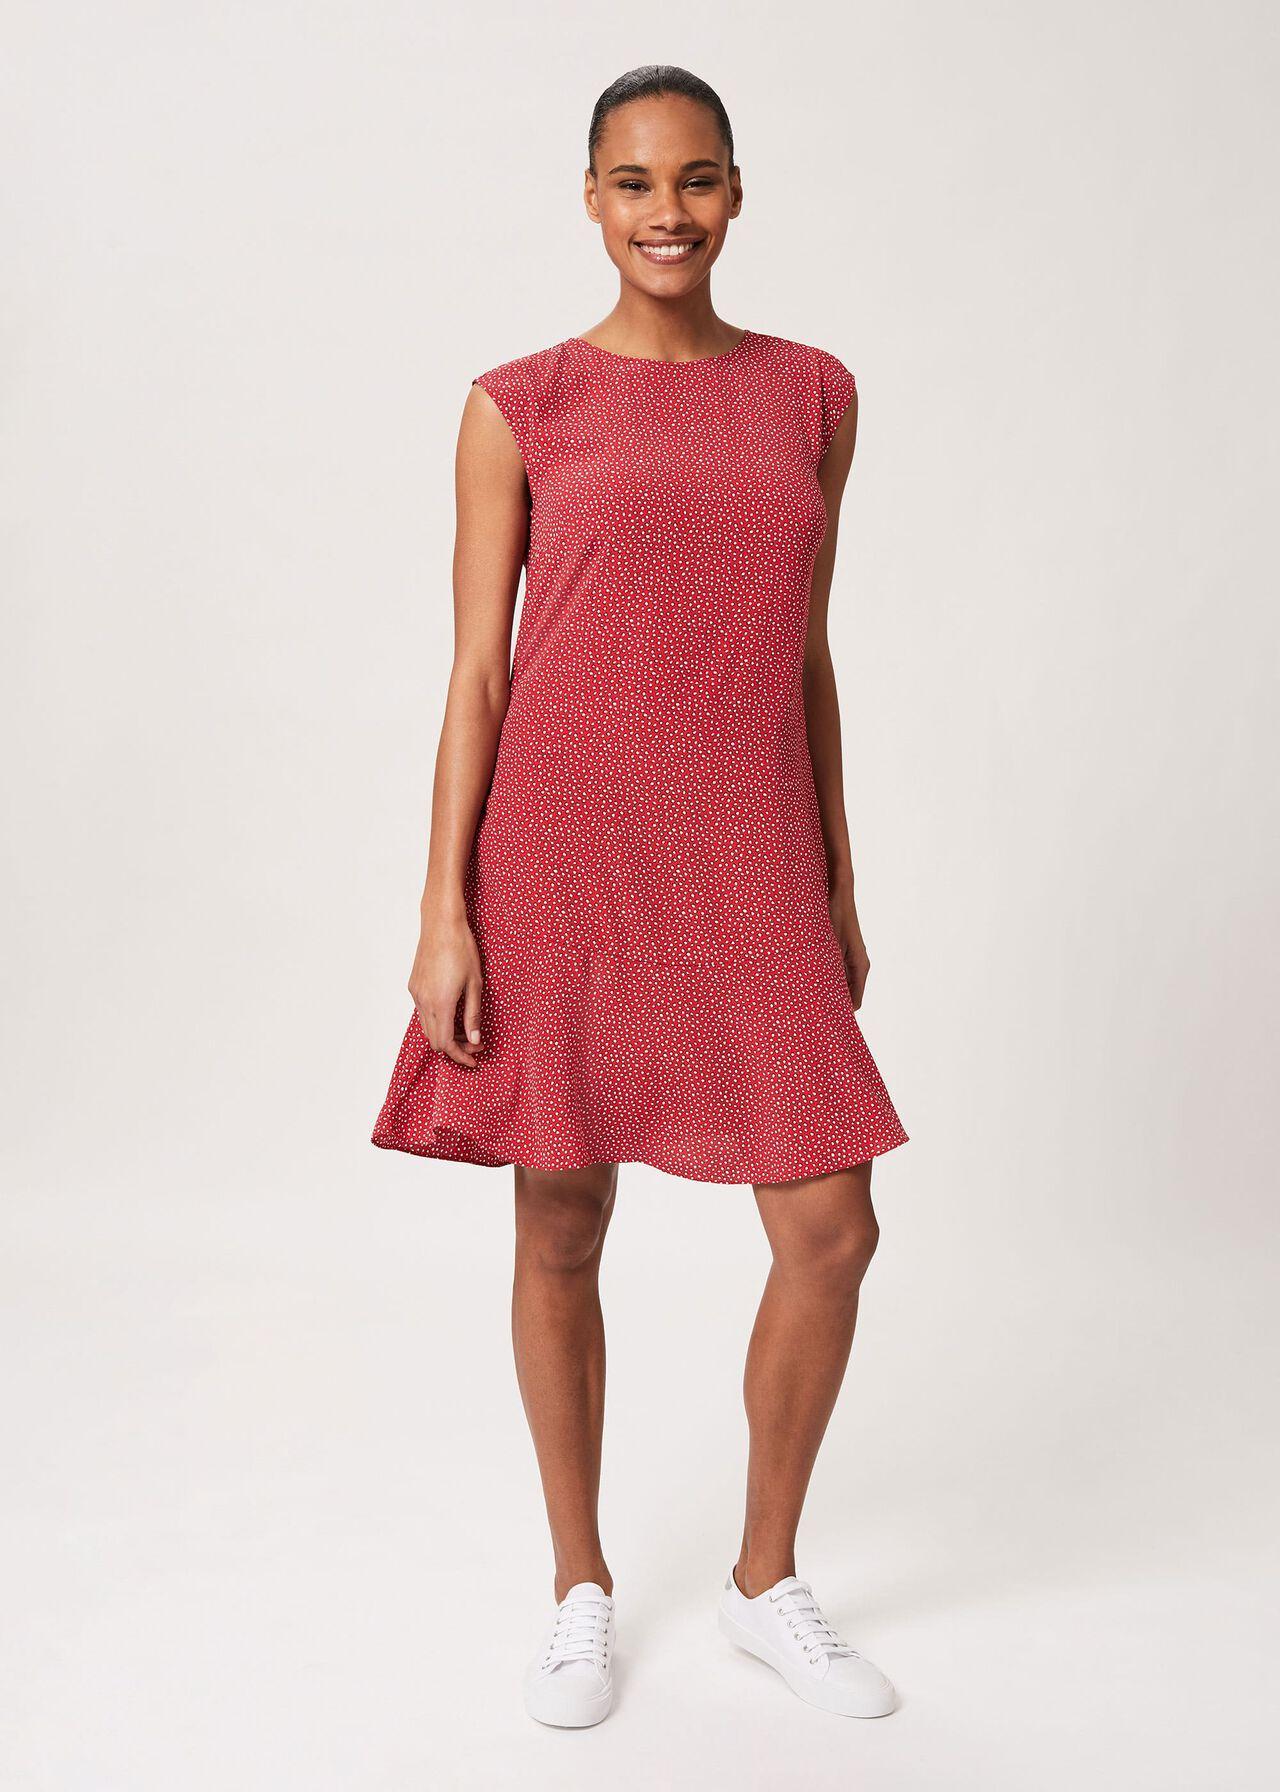 Catalina Spot Tunic Dress, Raspberry Ivory, hi-res